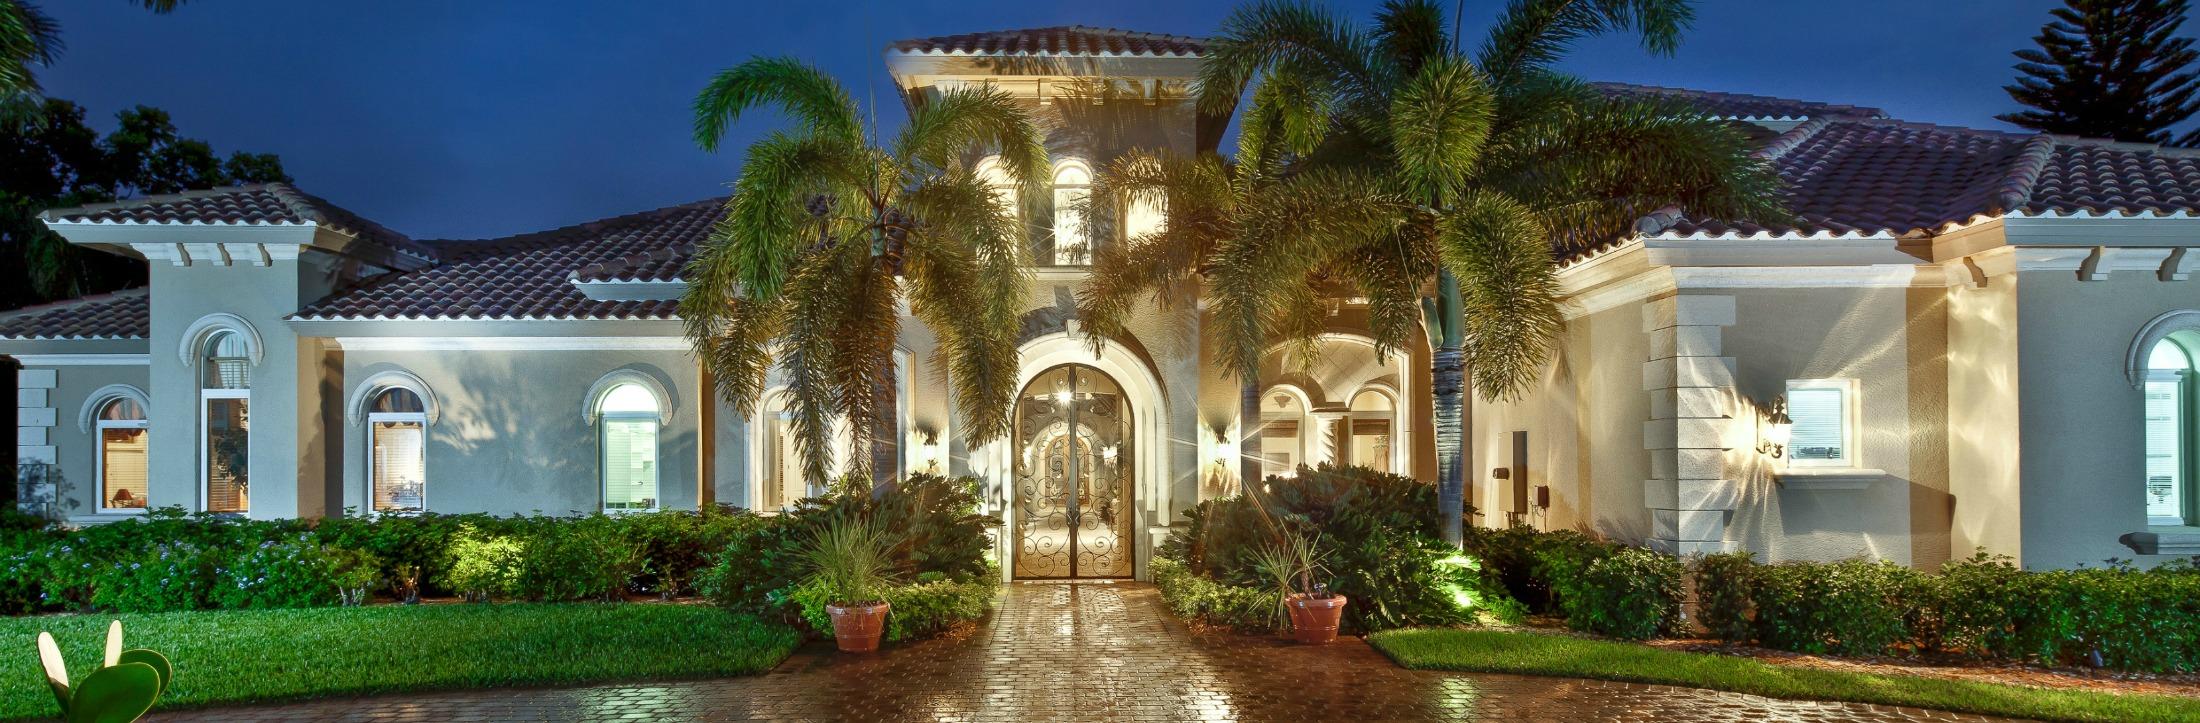 Palm Beach County FL Housing Market Report